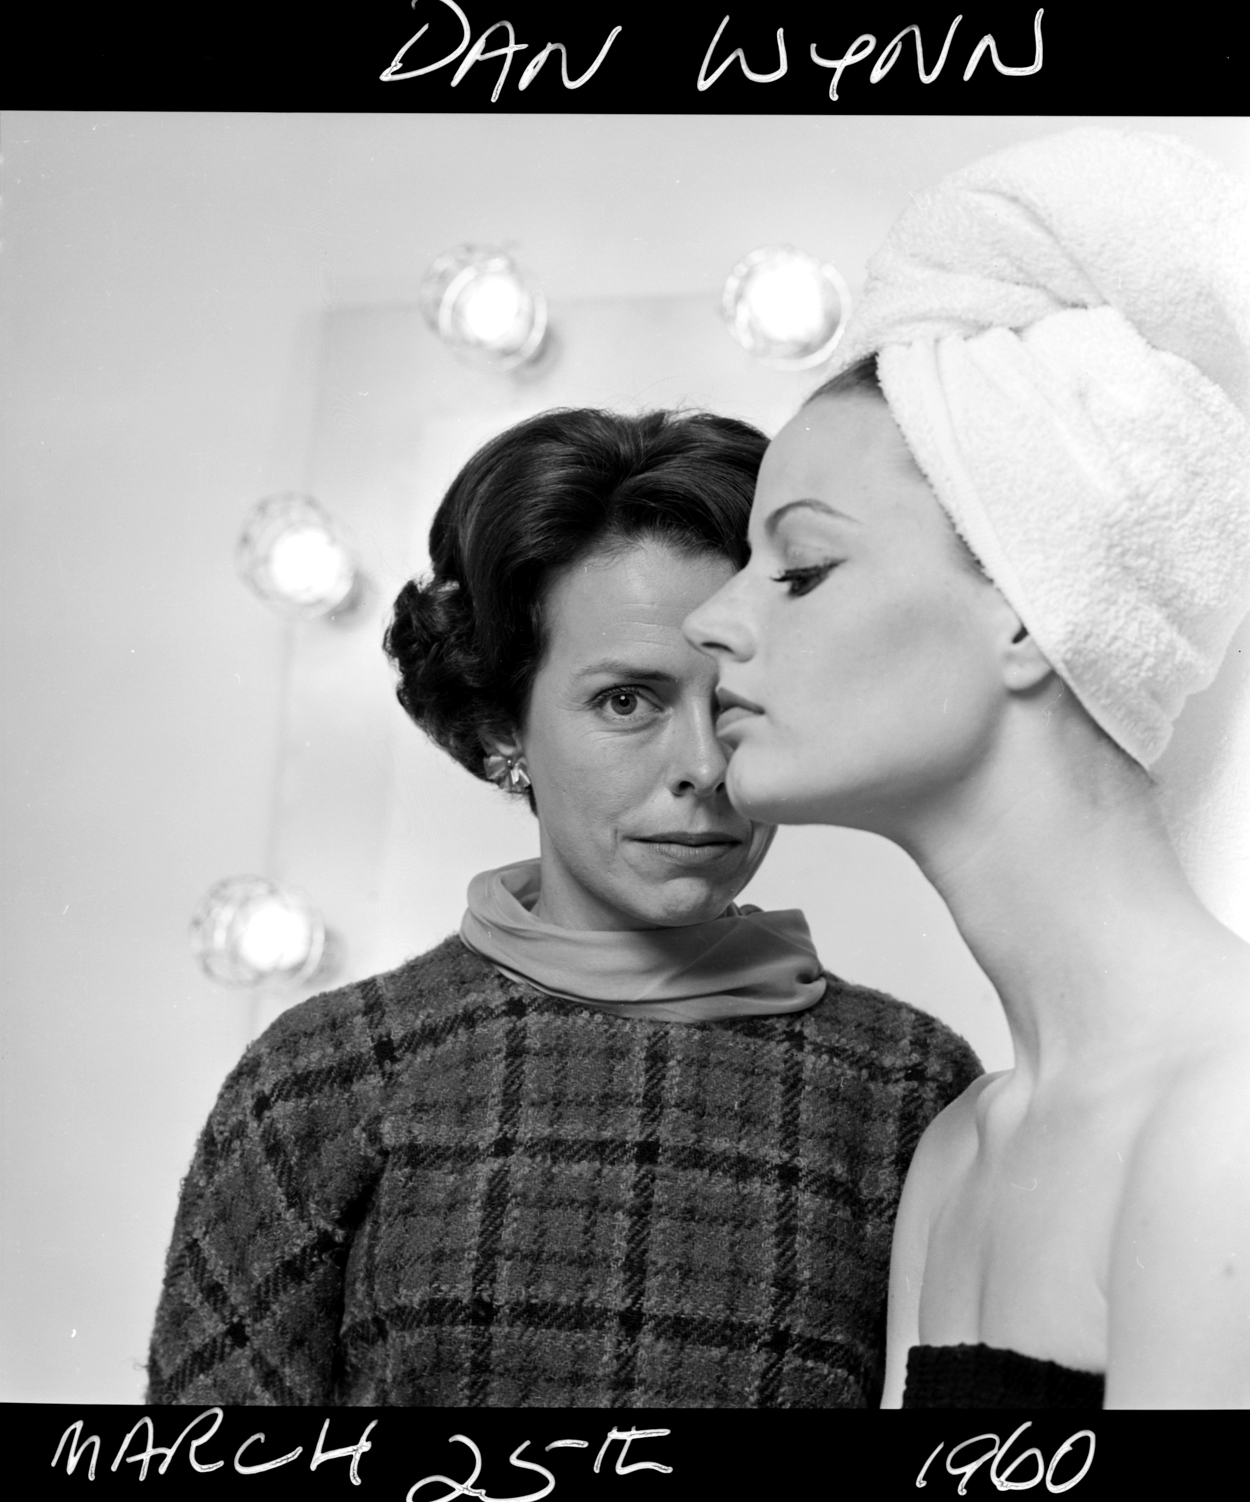 Eileen Ford, 1960